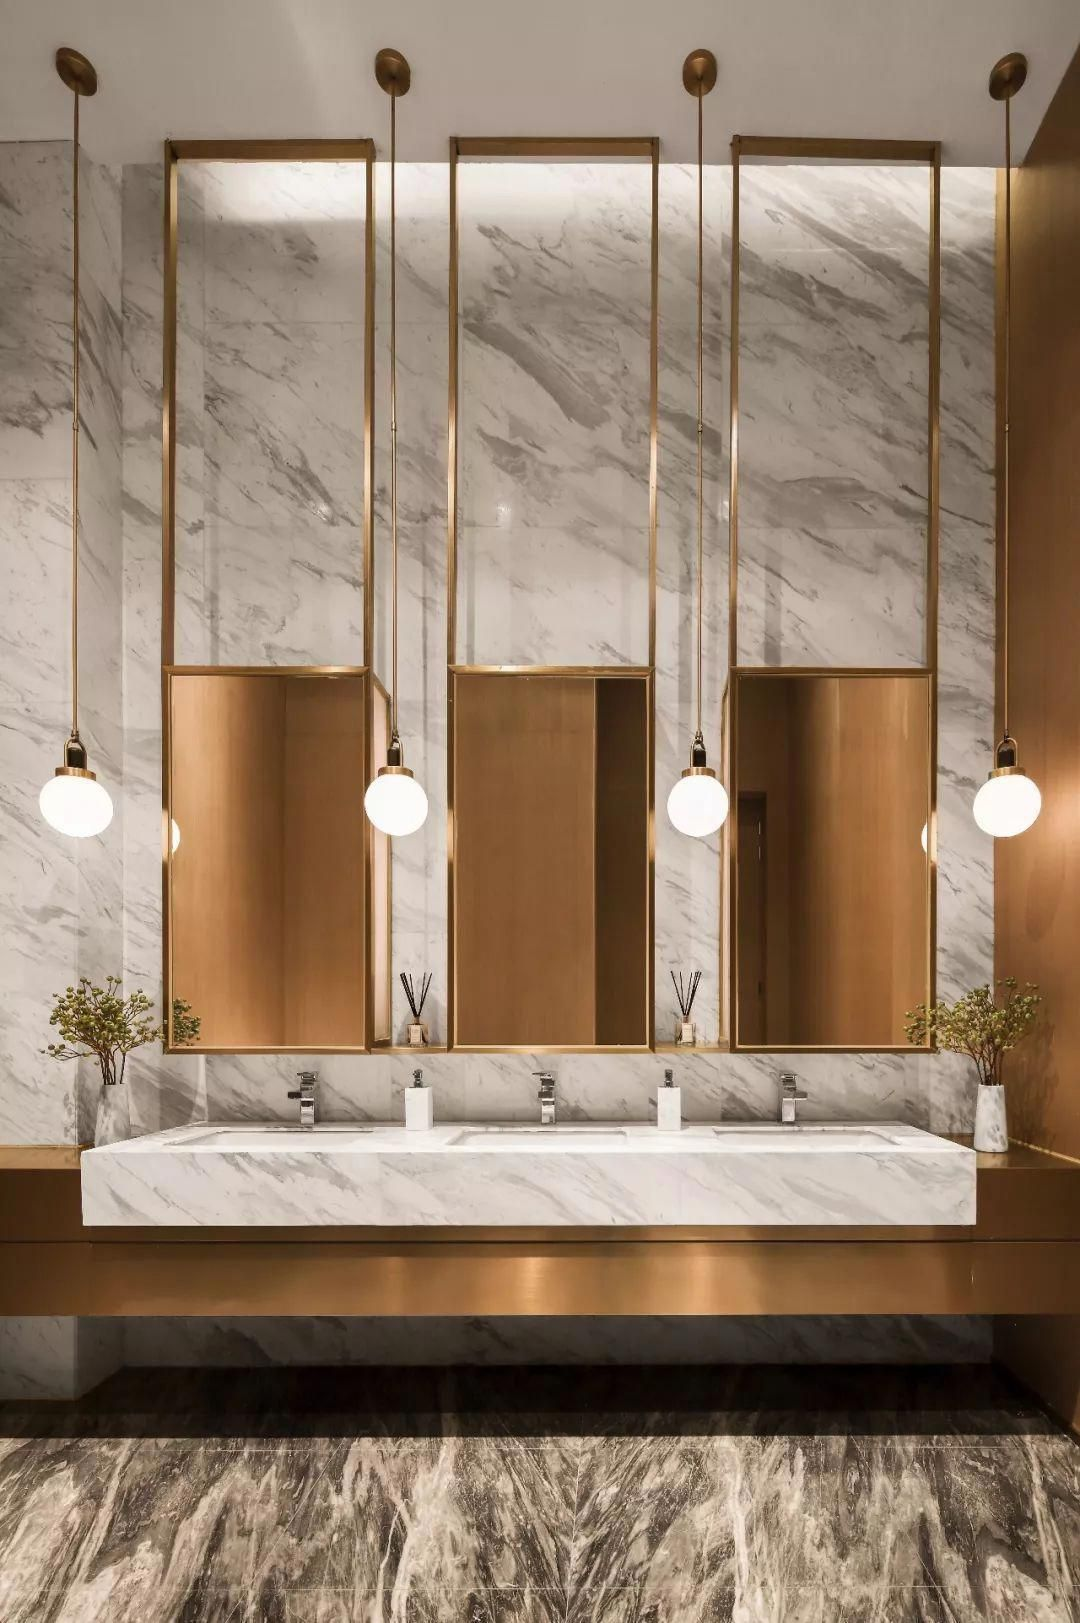 Glamorous And Exciting Luxury Bathroom Interior Decor Needs The Perfect Lighting Fixture Bathroom Design Trends Bathroom Design Luxury Bathroom Lighting Design